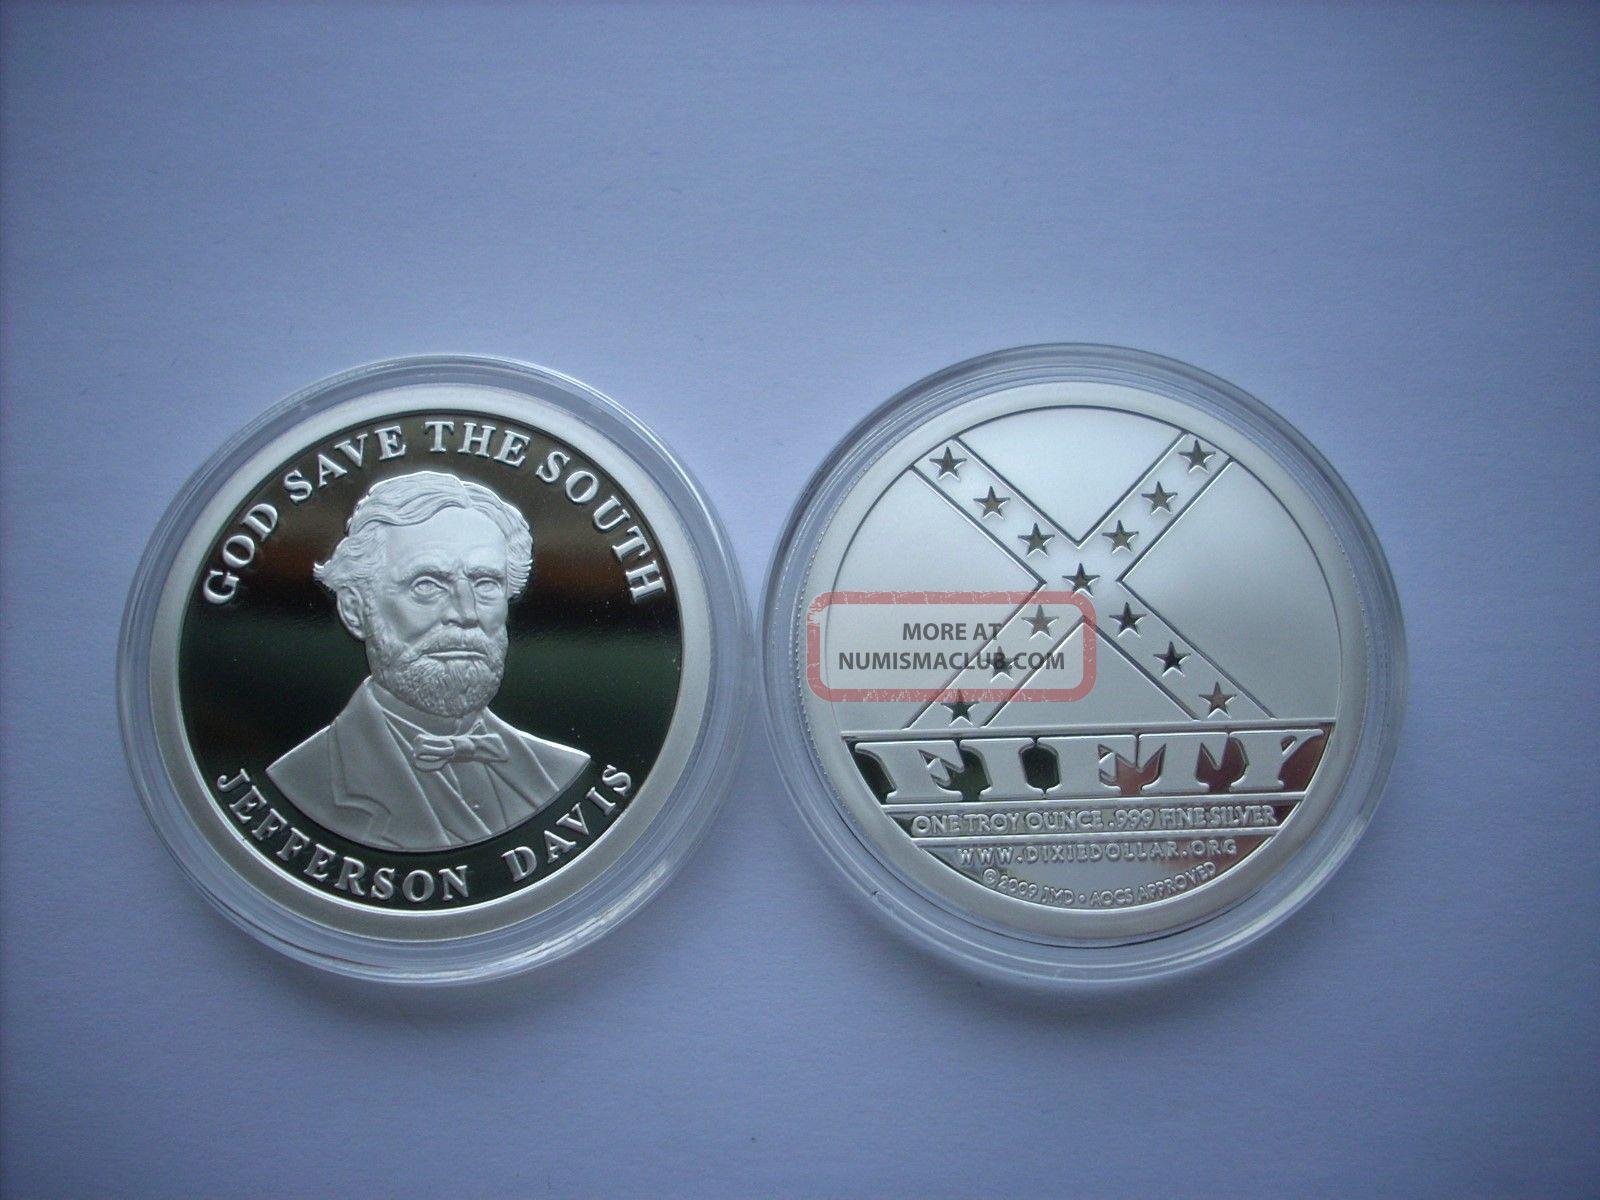 1 Oz Silver Coin Jefferson Davis Dixie Dollar Civil War